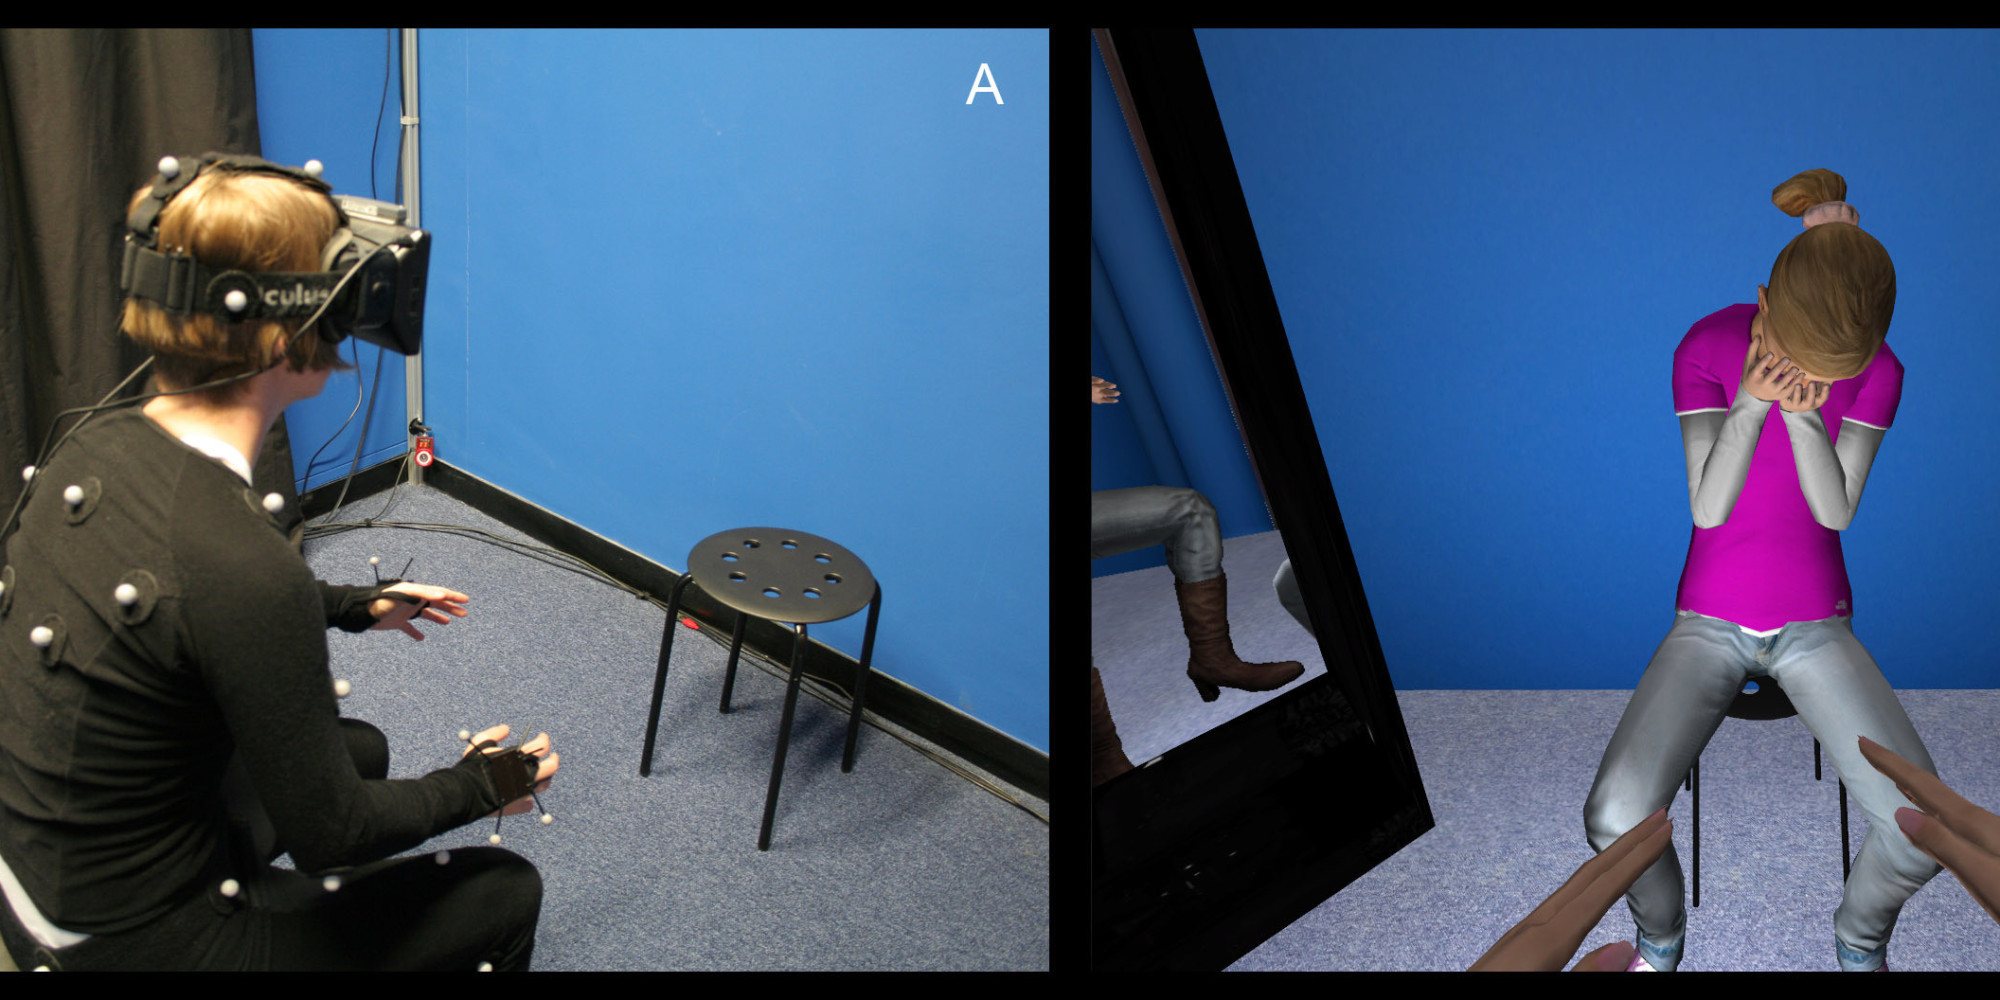 Virtual reality erotic pics exposed videos